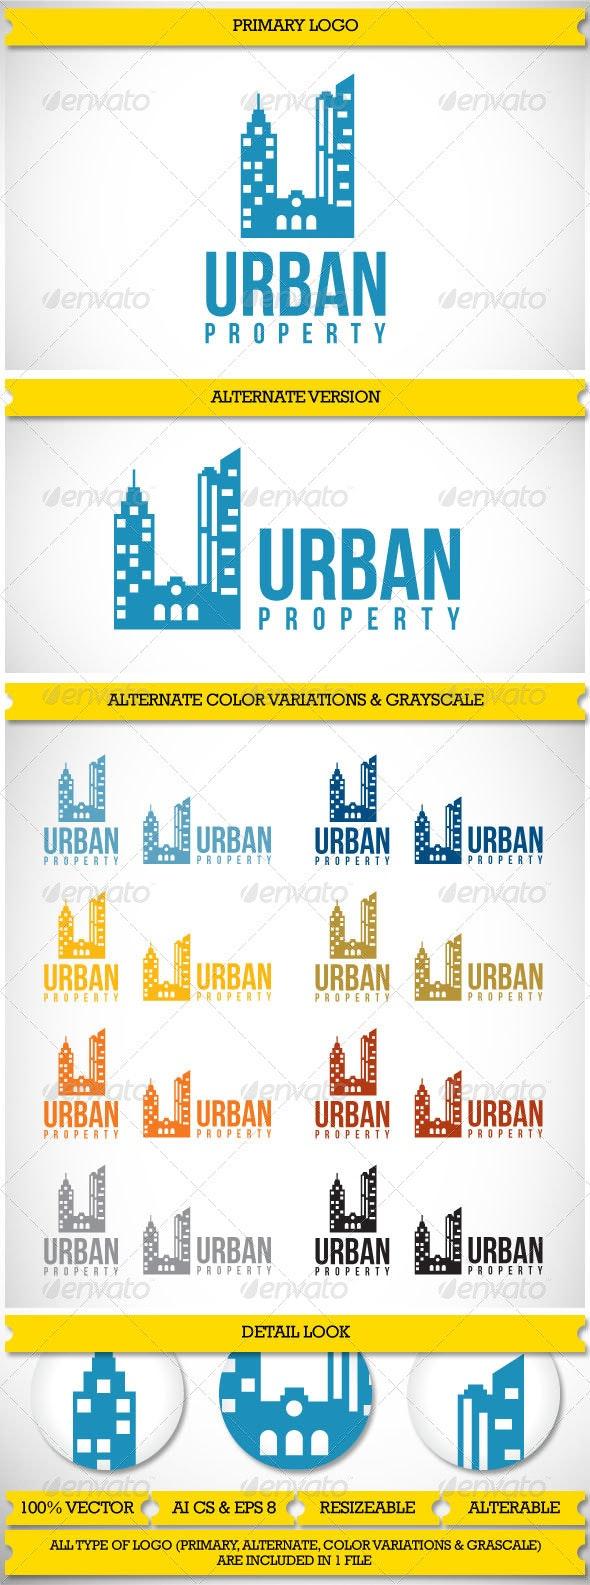 Property Realty Urban logo